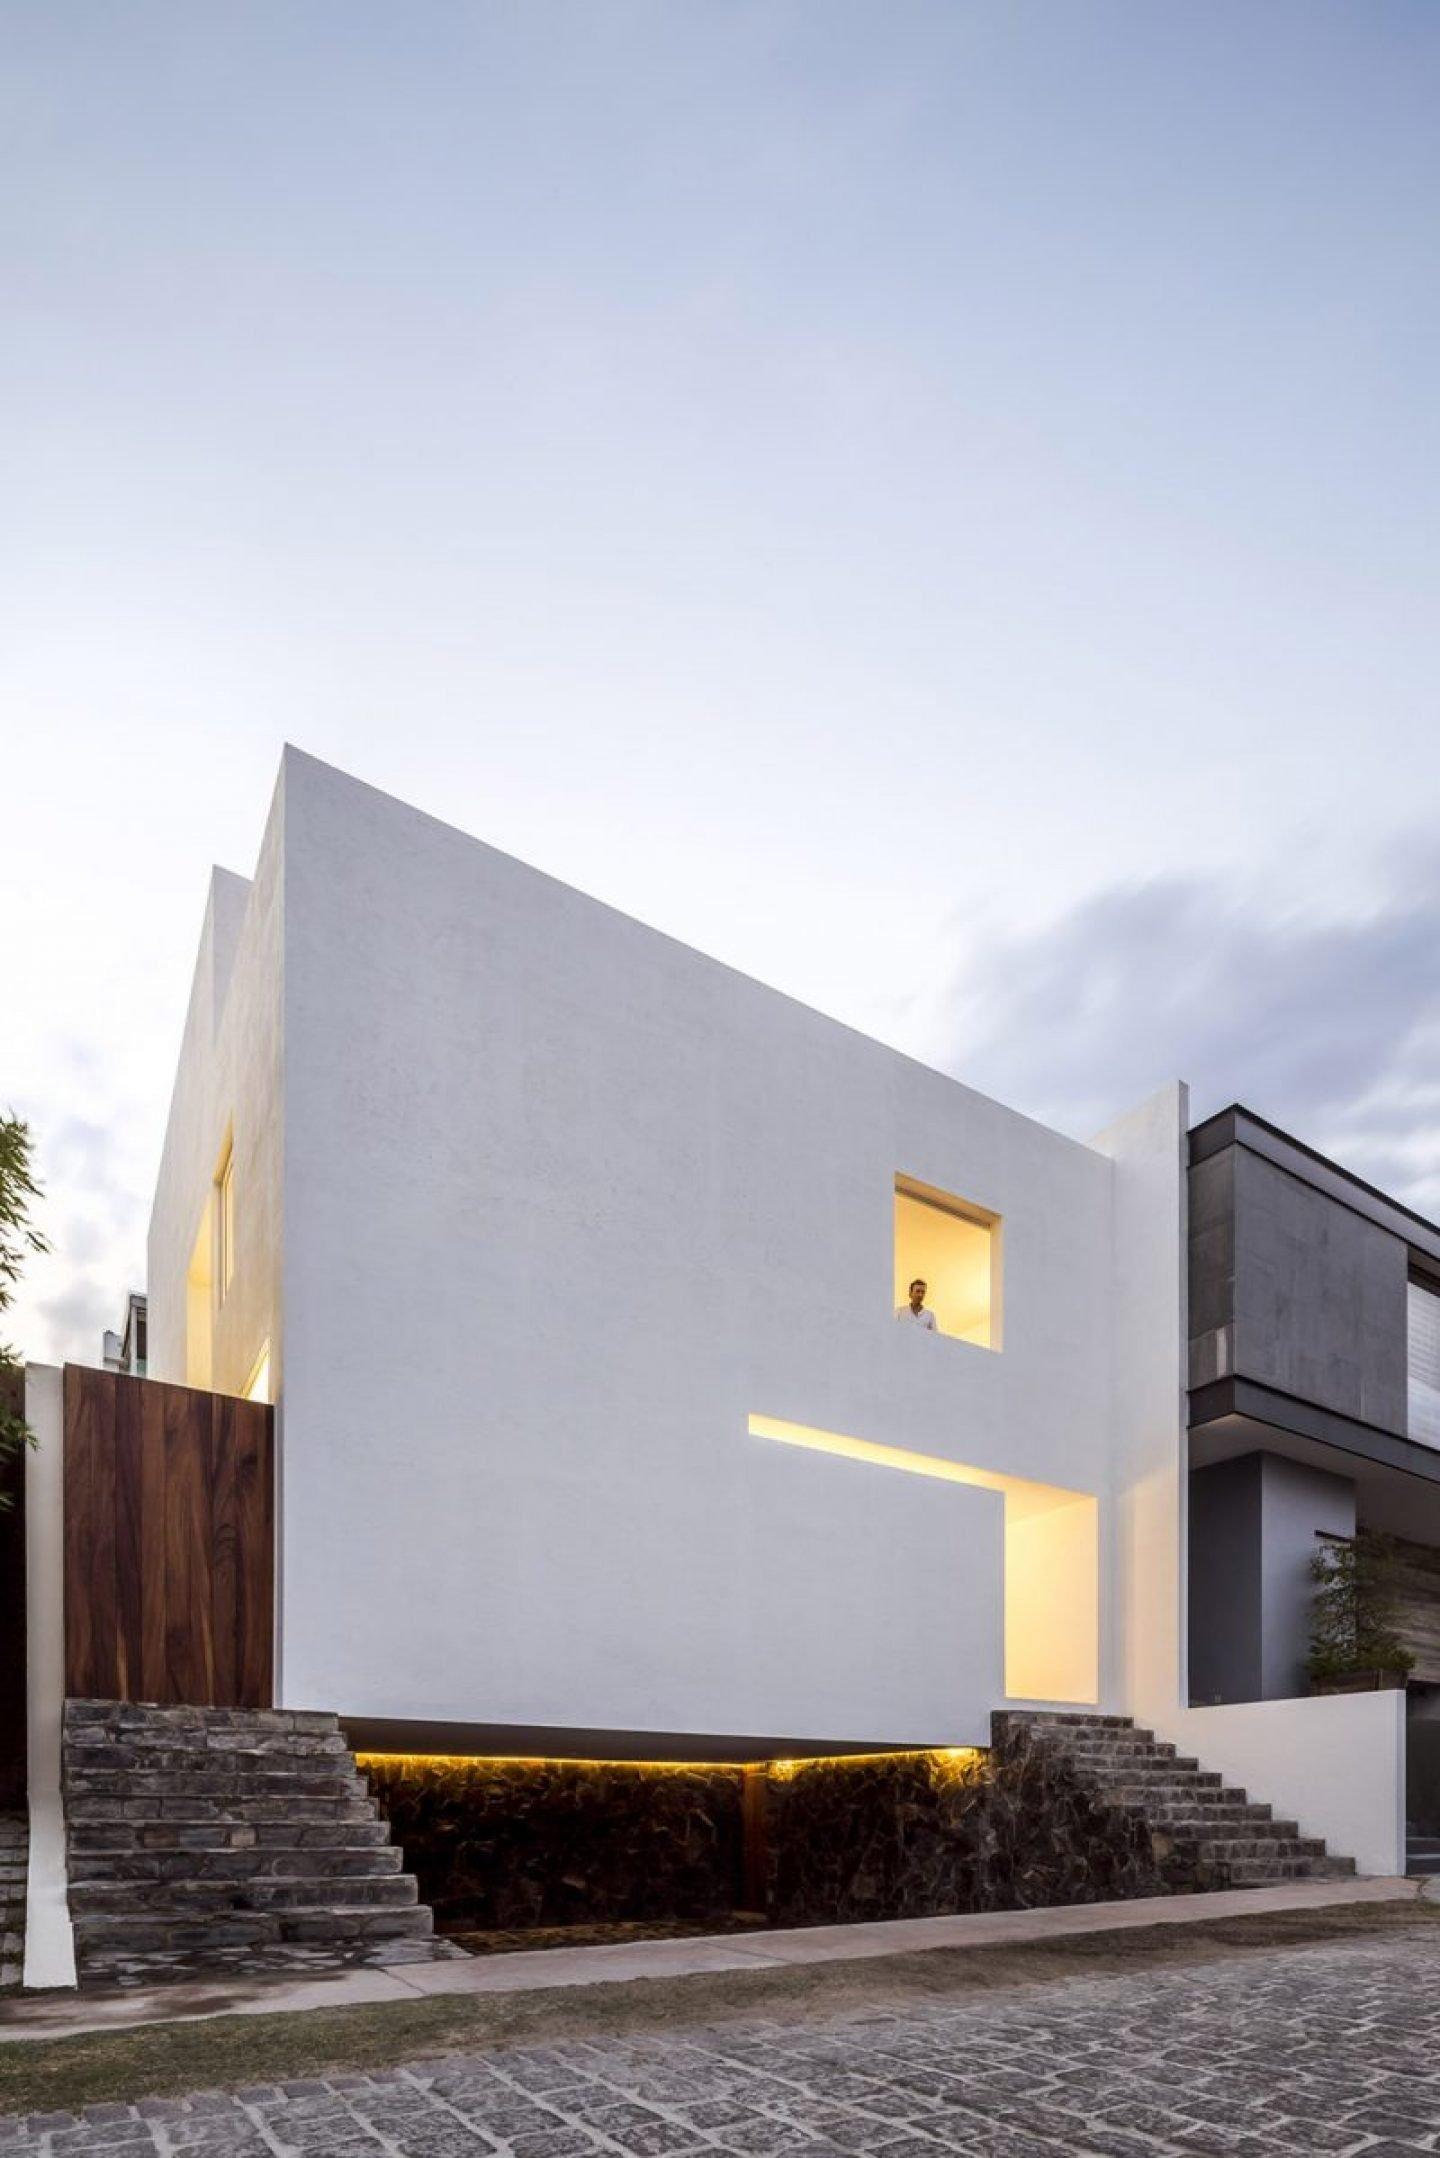 iGNANT_Architecture_Cave_House_Abraham_Cota_Paredes22